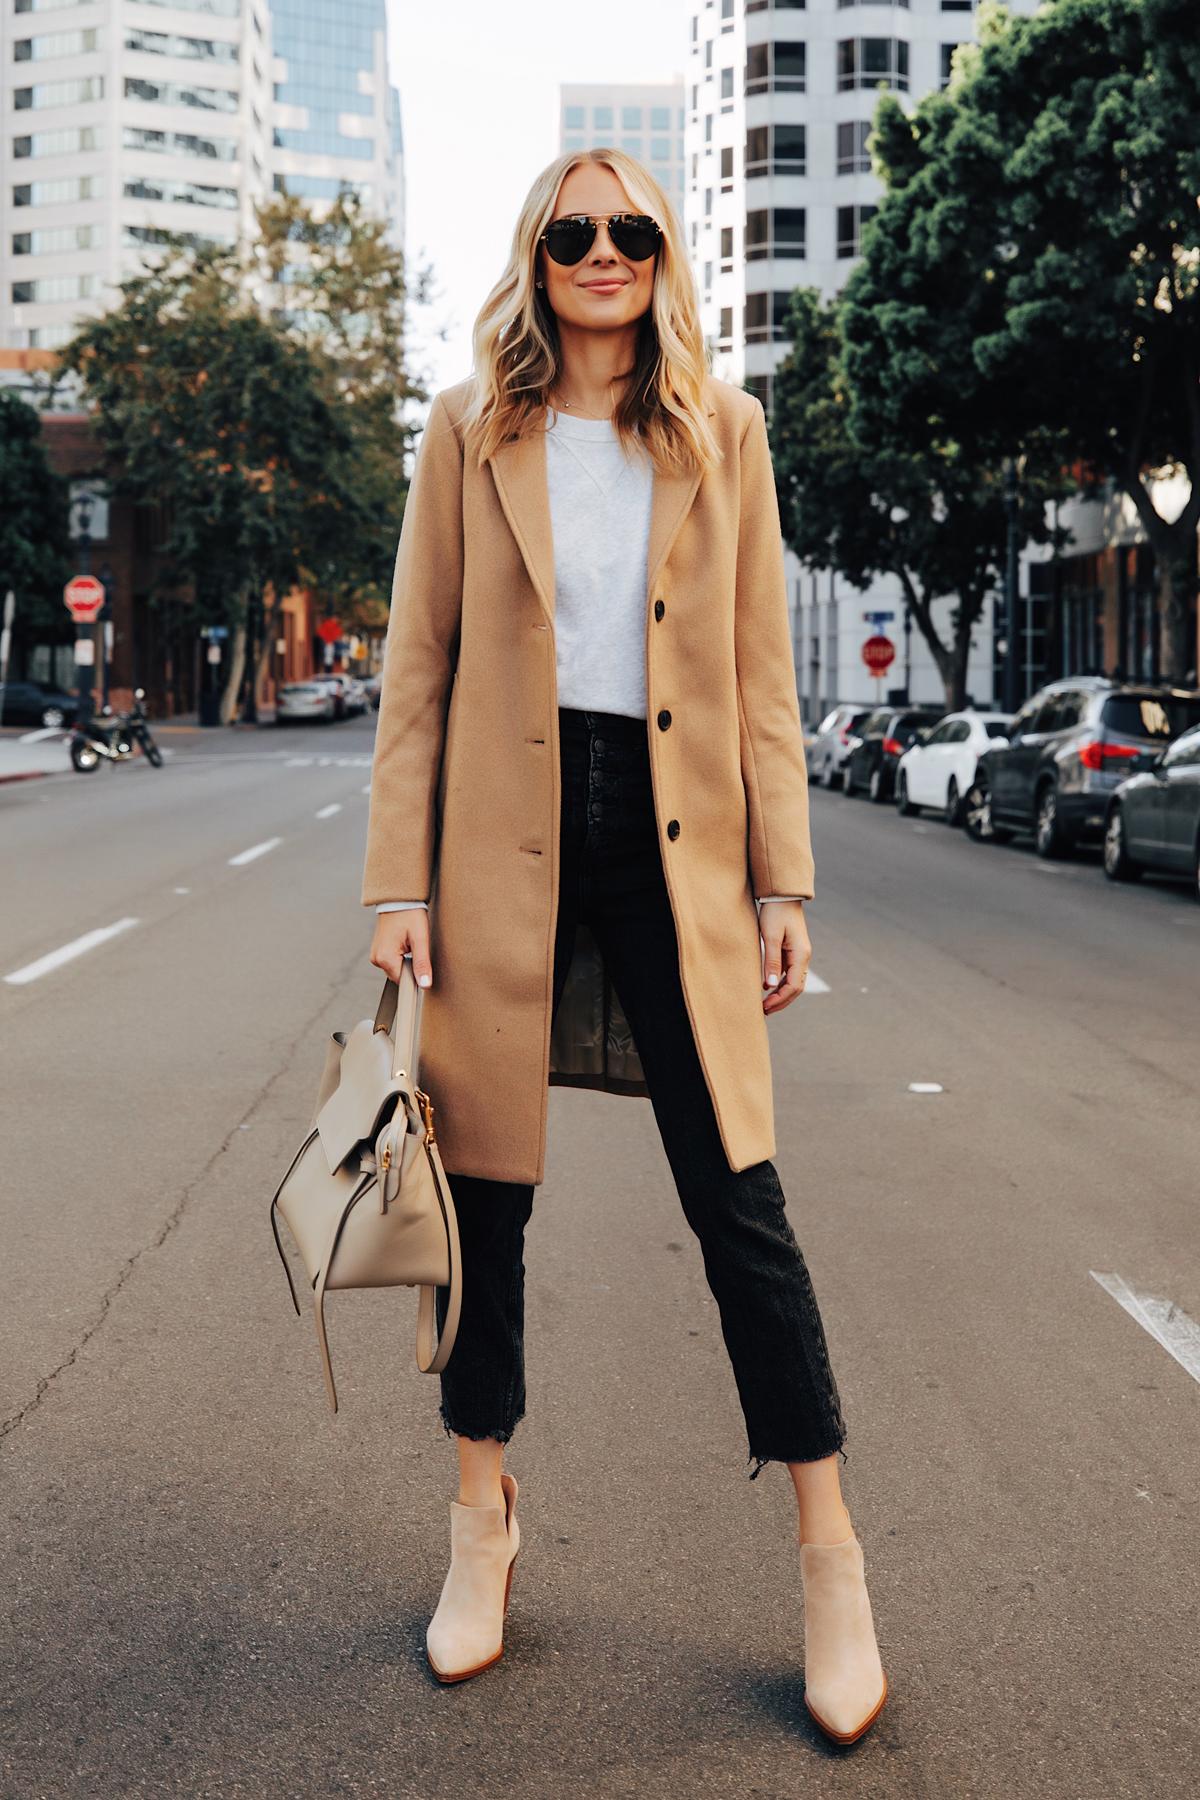 Fashion Jackson Wearing Abercrombie Camel Coat Grey Sweatshirt Black Raw Hem Jeans Tan Suede Booties Fall Outfit 1